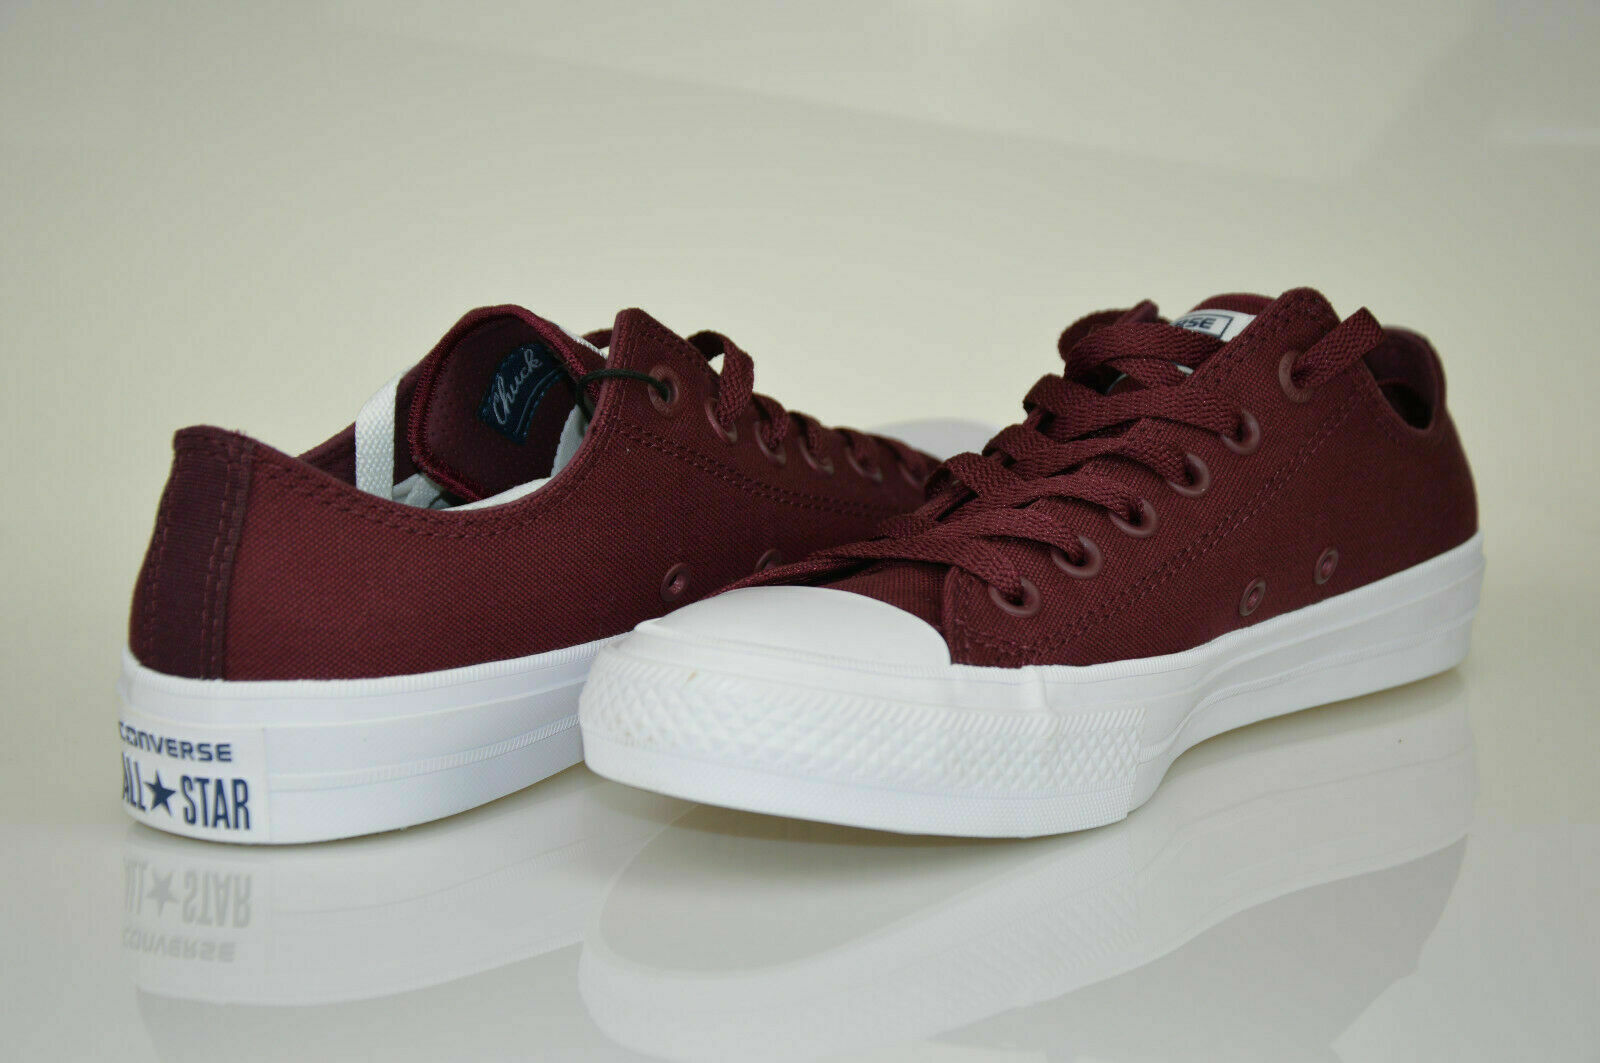 Converse Chuck Taylor All Star II Ox 150150c Sneaker Unisex   43